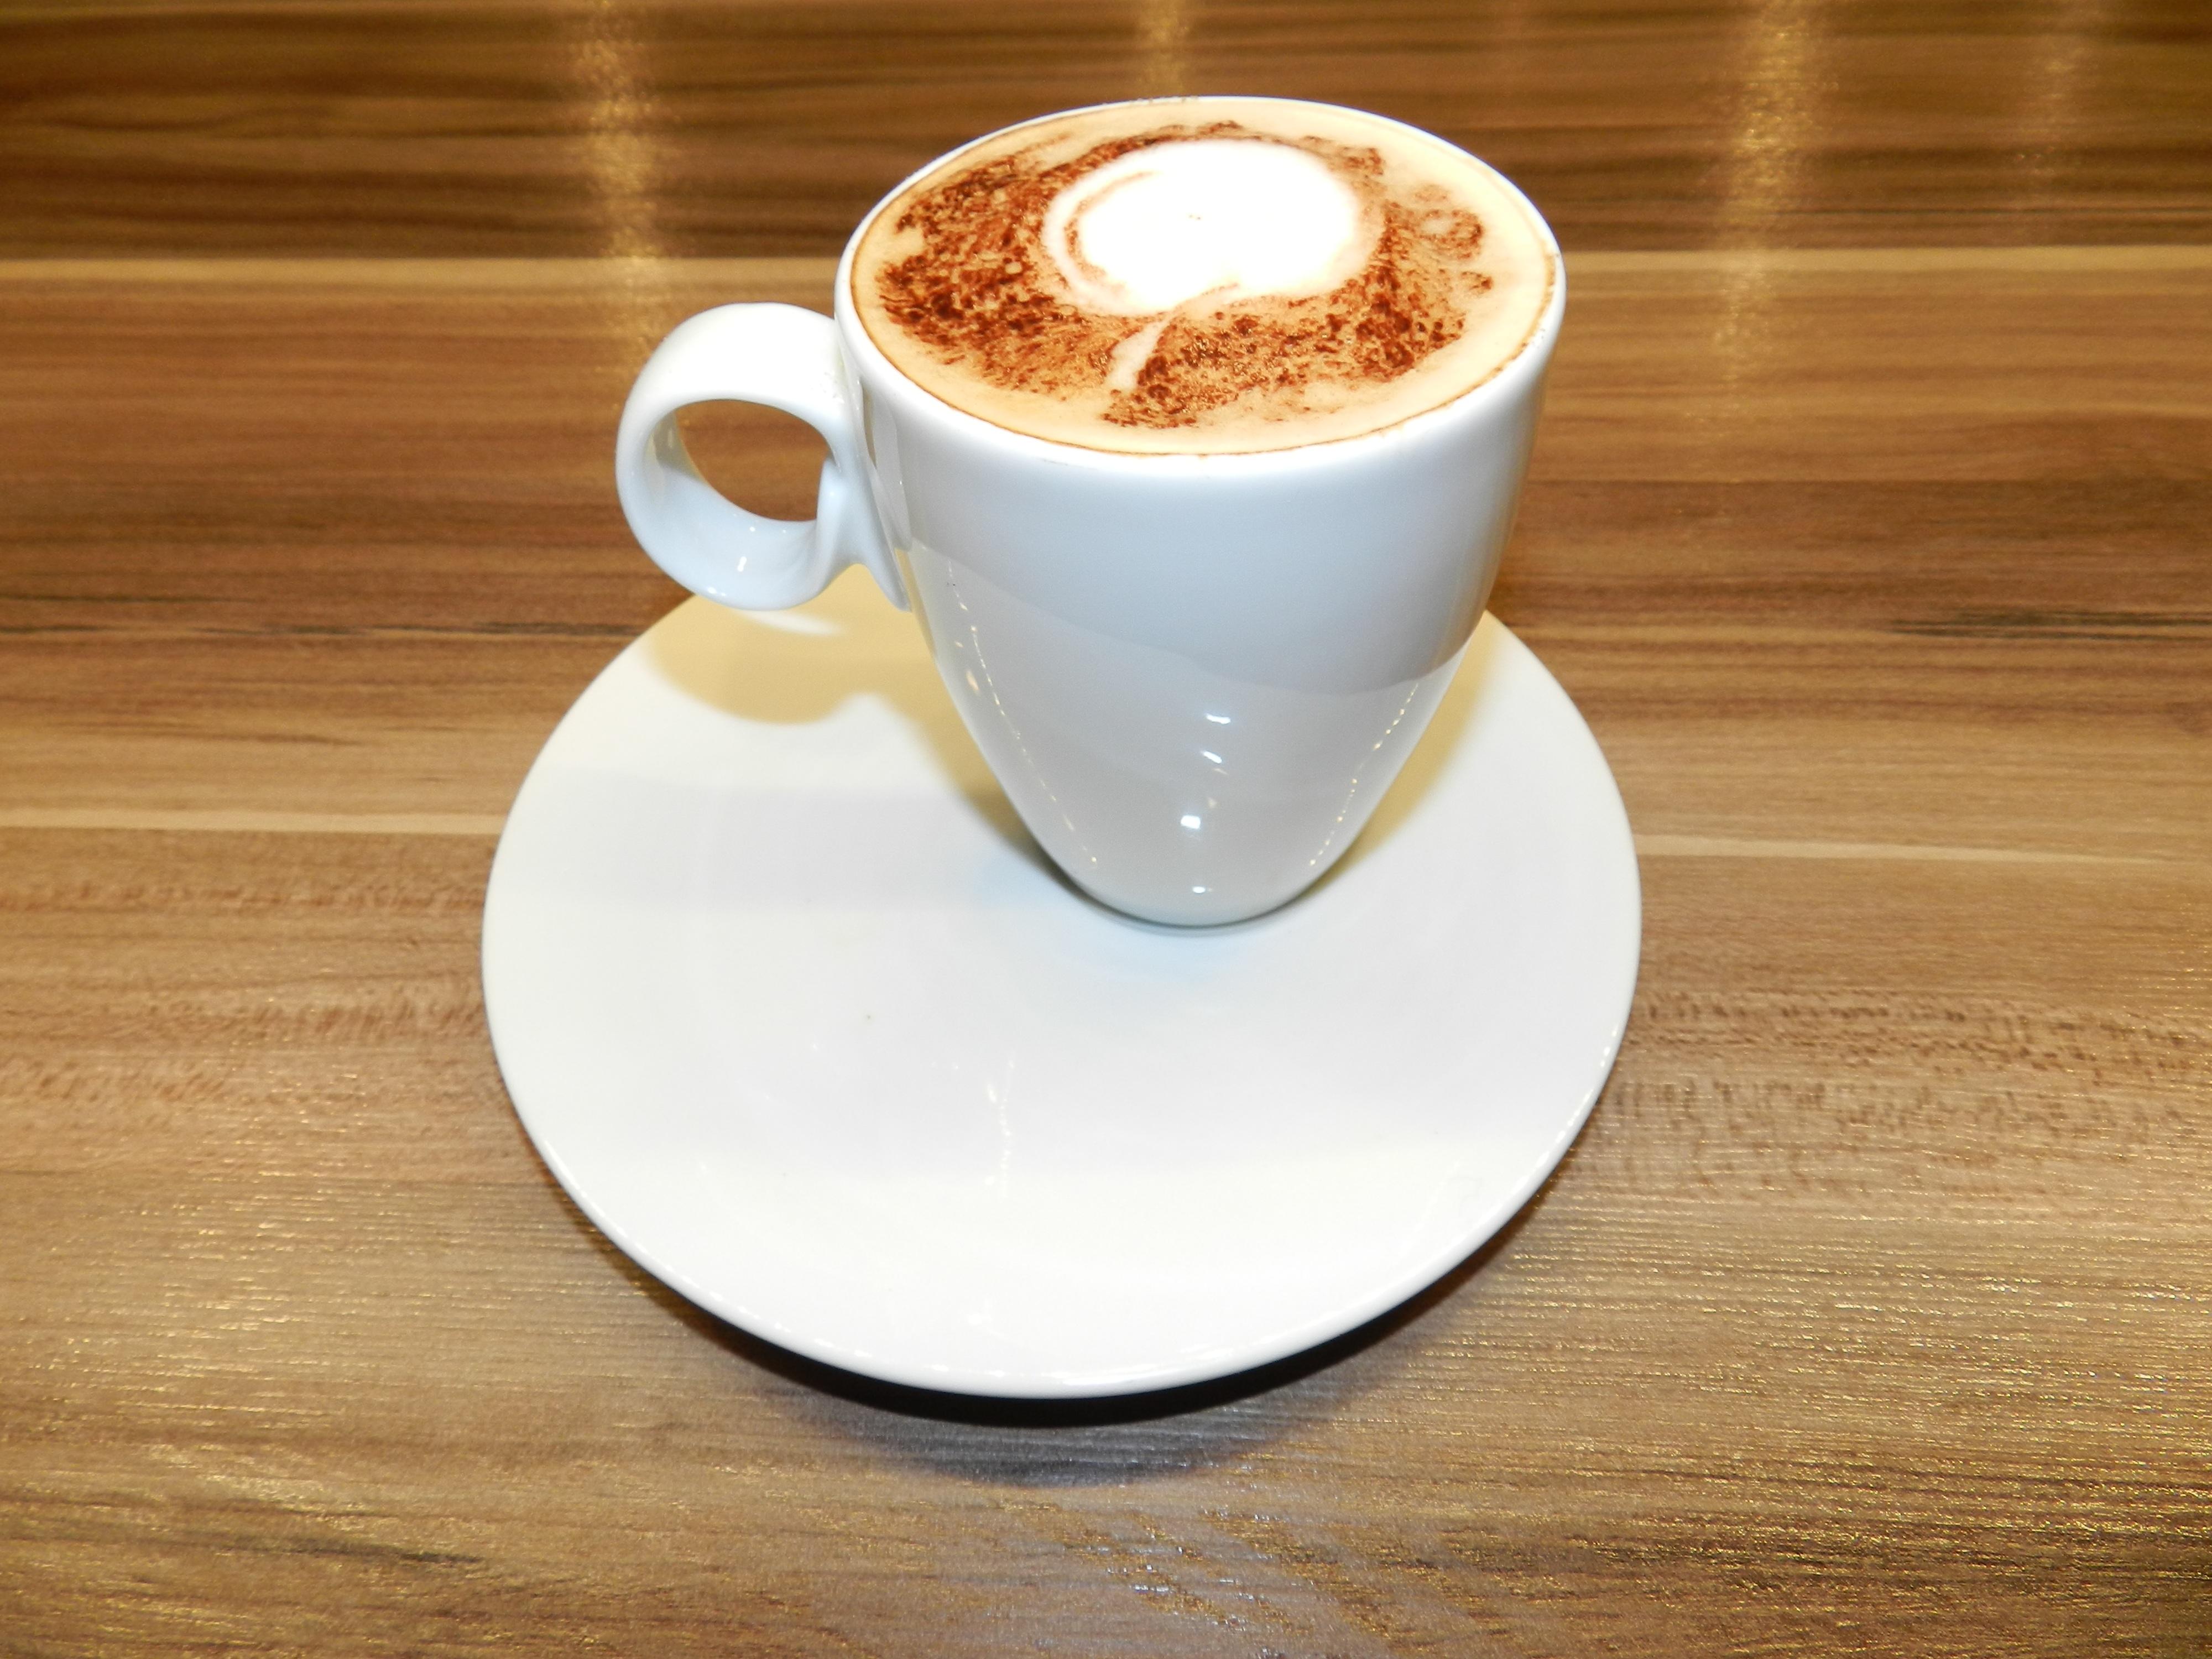 Kostenlose foto tasse latt cappuccino lebensmittel getr nk espresso kaffeetasse - Bilder cappuccino ...